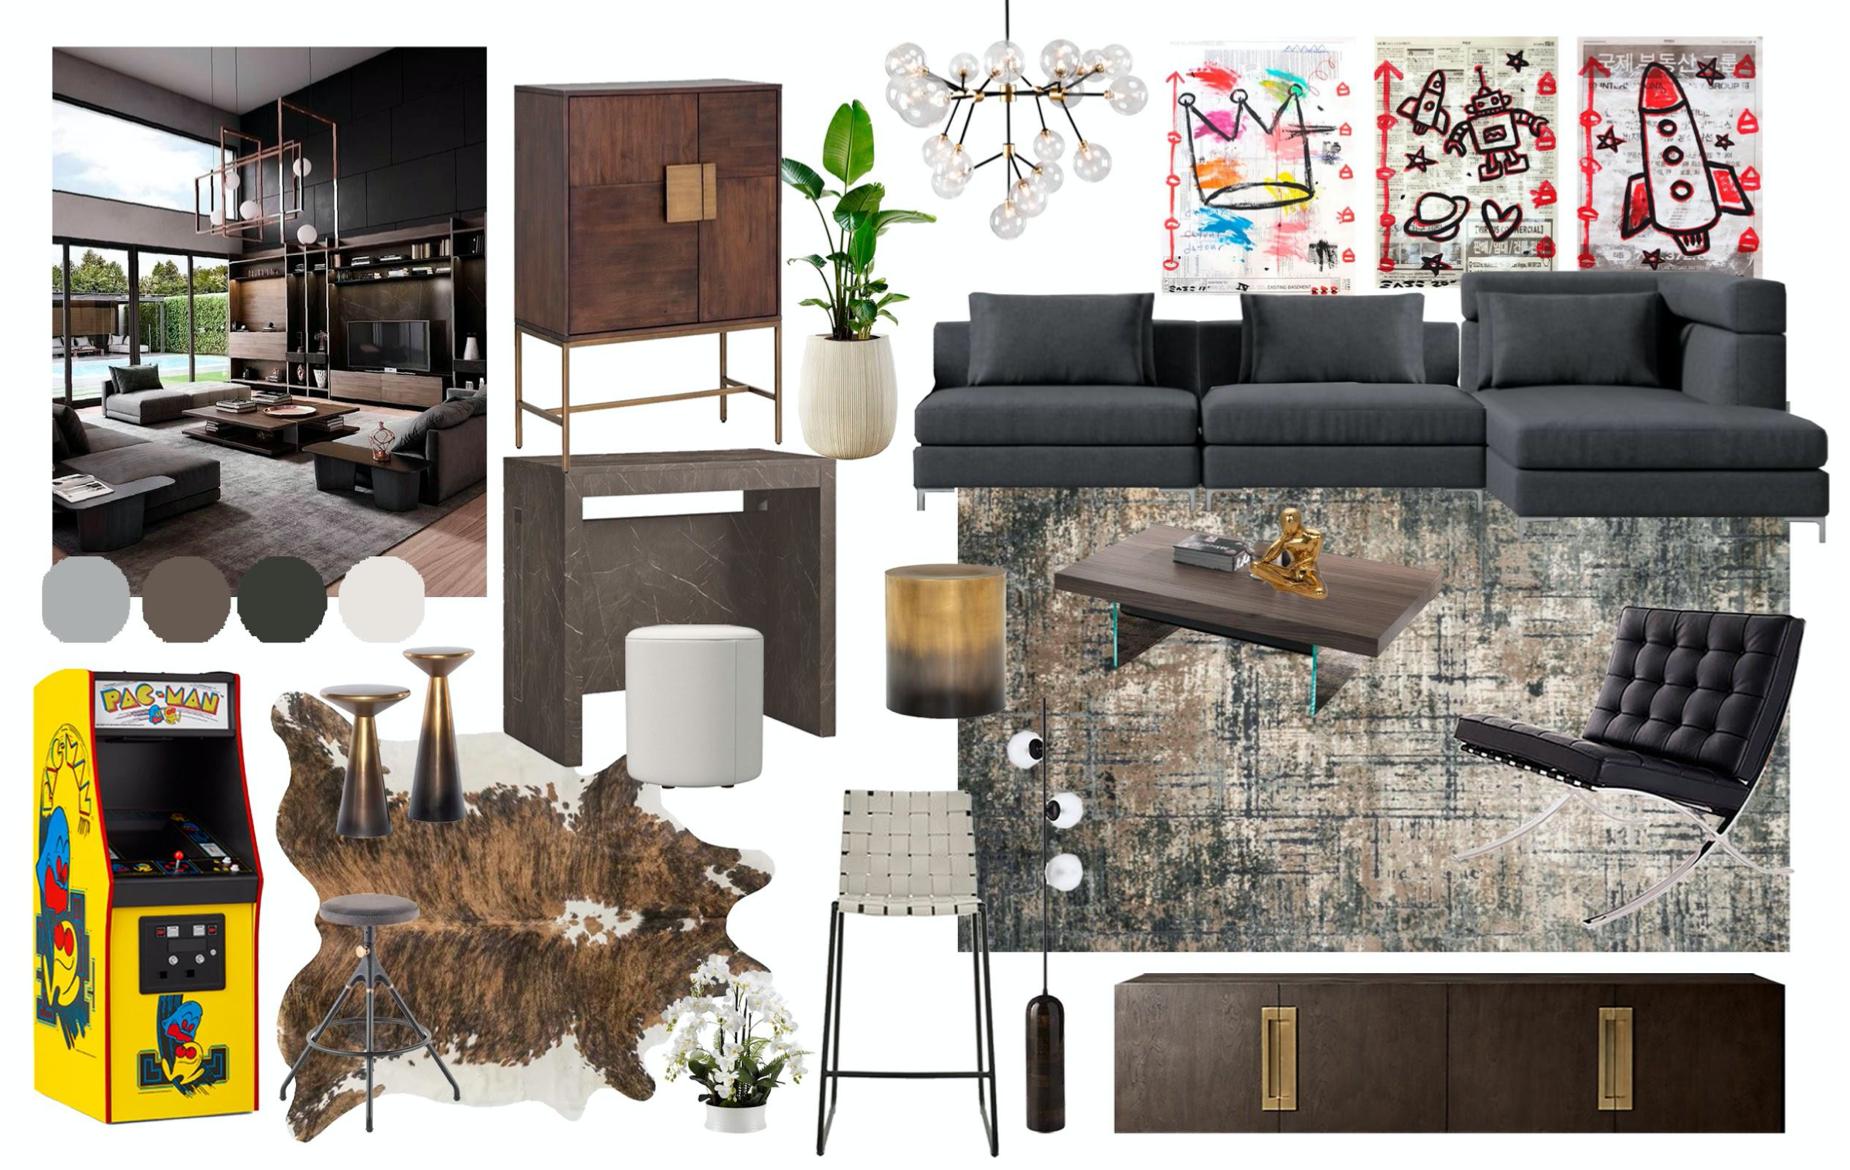 rterior-studio-westside-la-bachelor-pad-furnishing-inspirations-mood-board-monochromatic